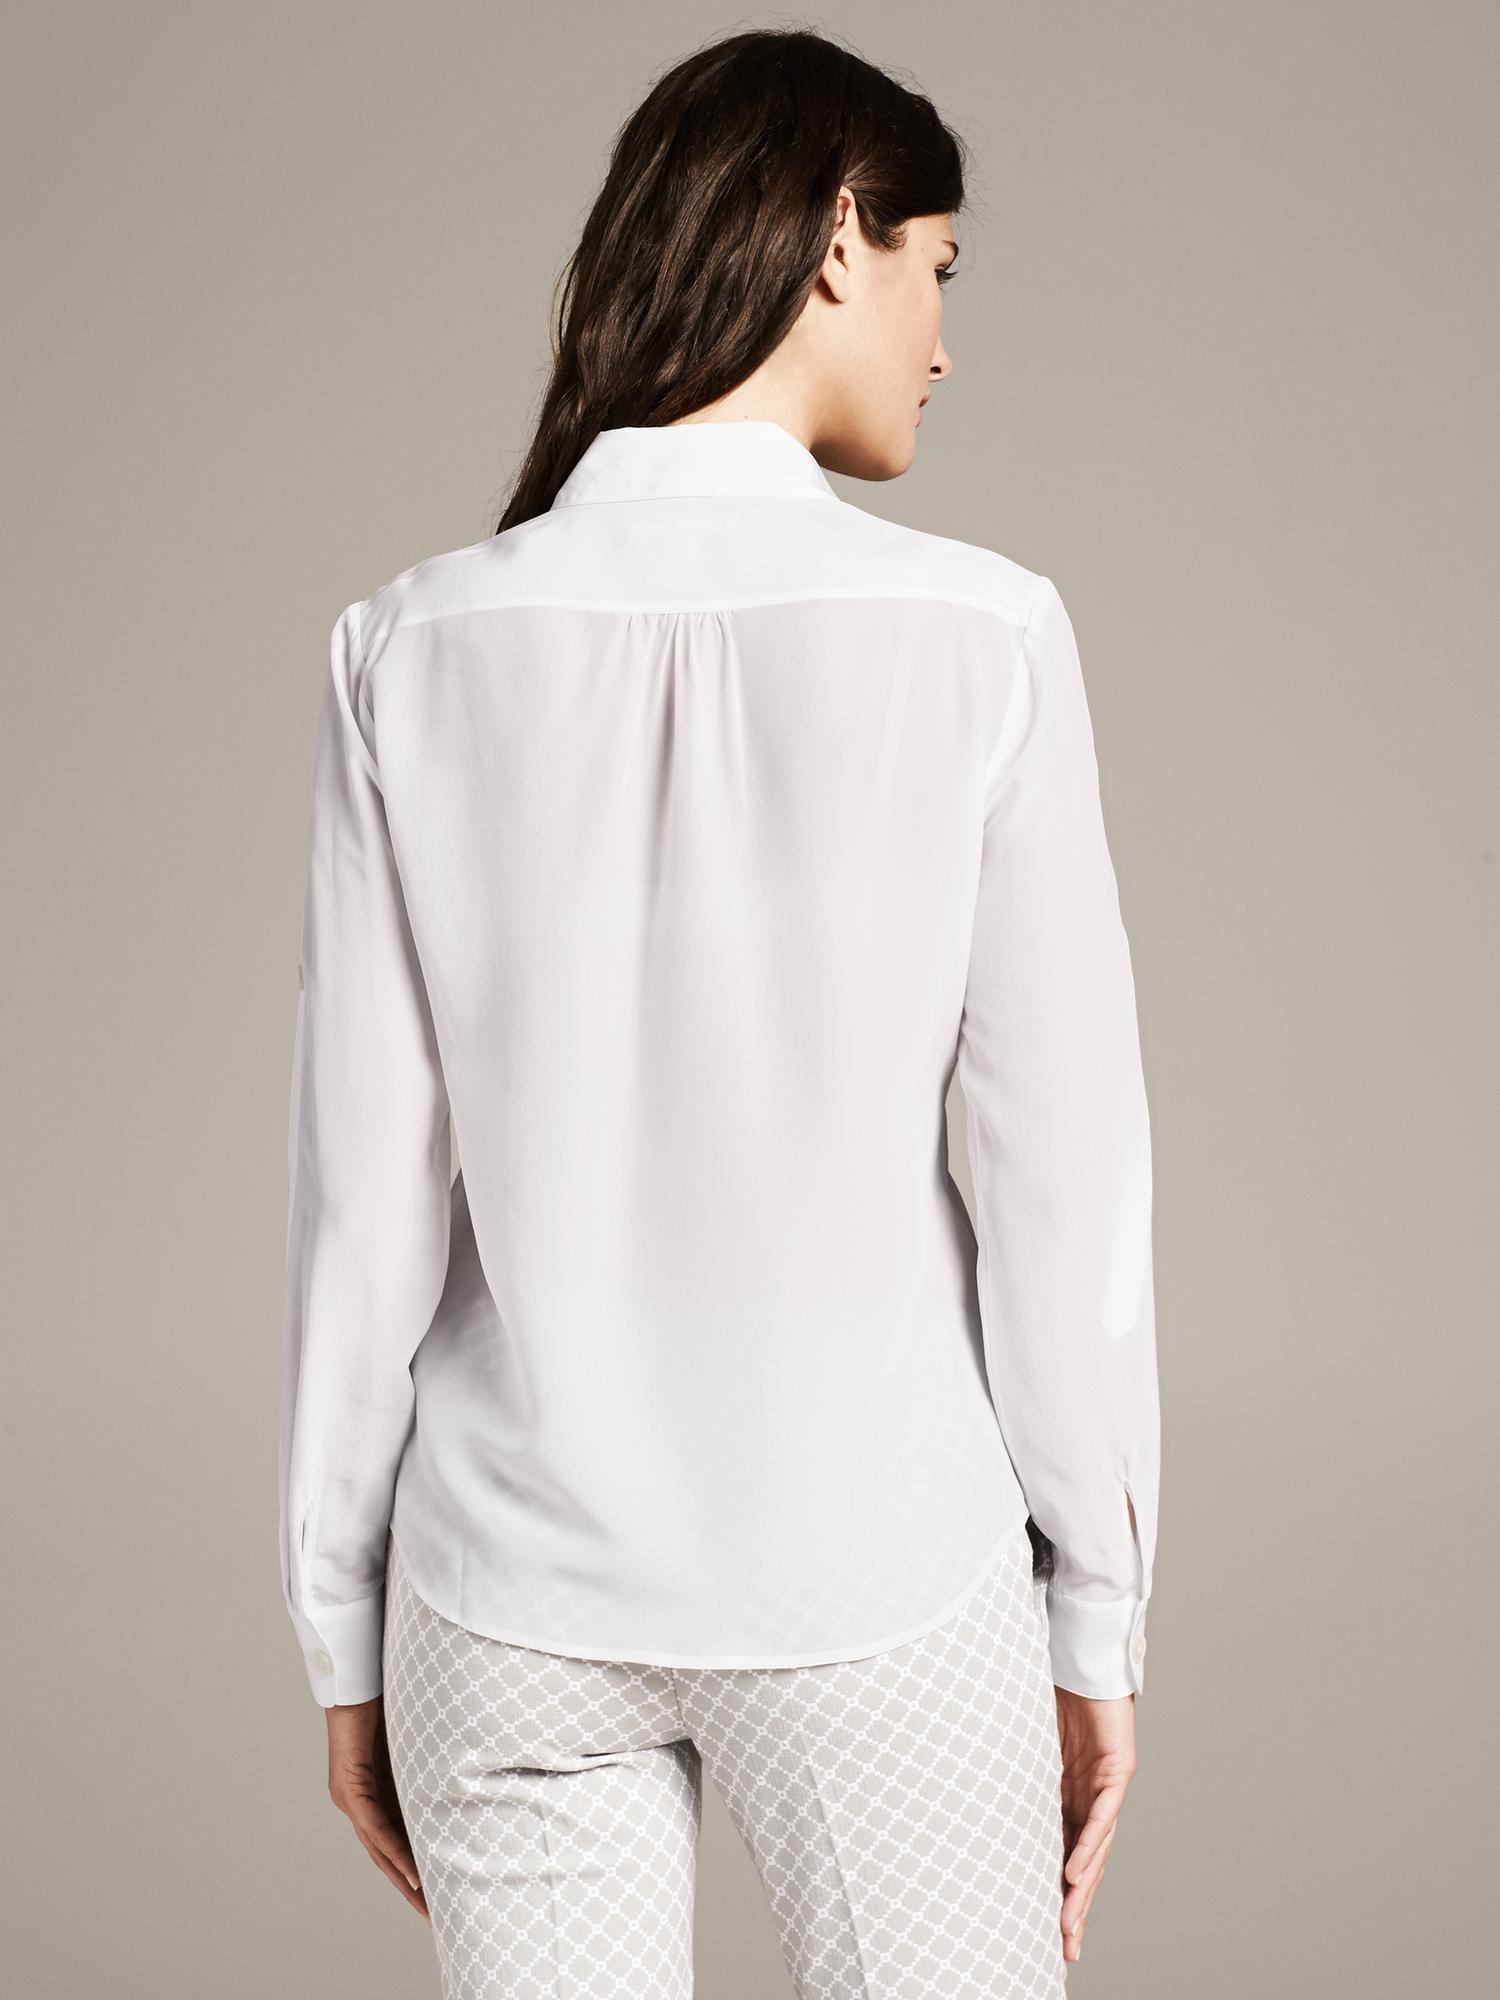 09930464491508 Lyst - Banana Republic White Silk Utility Blouse in White